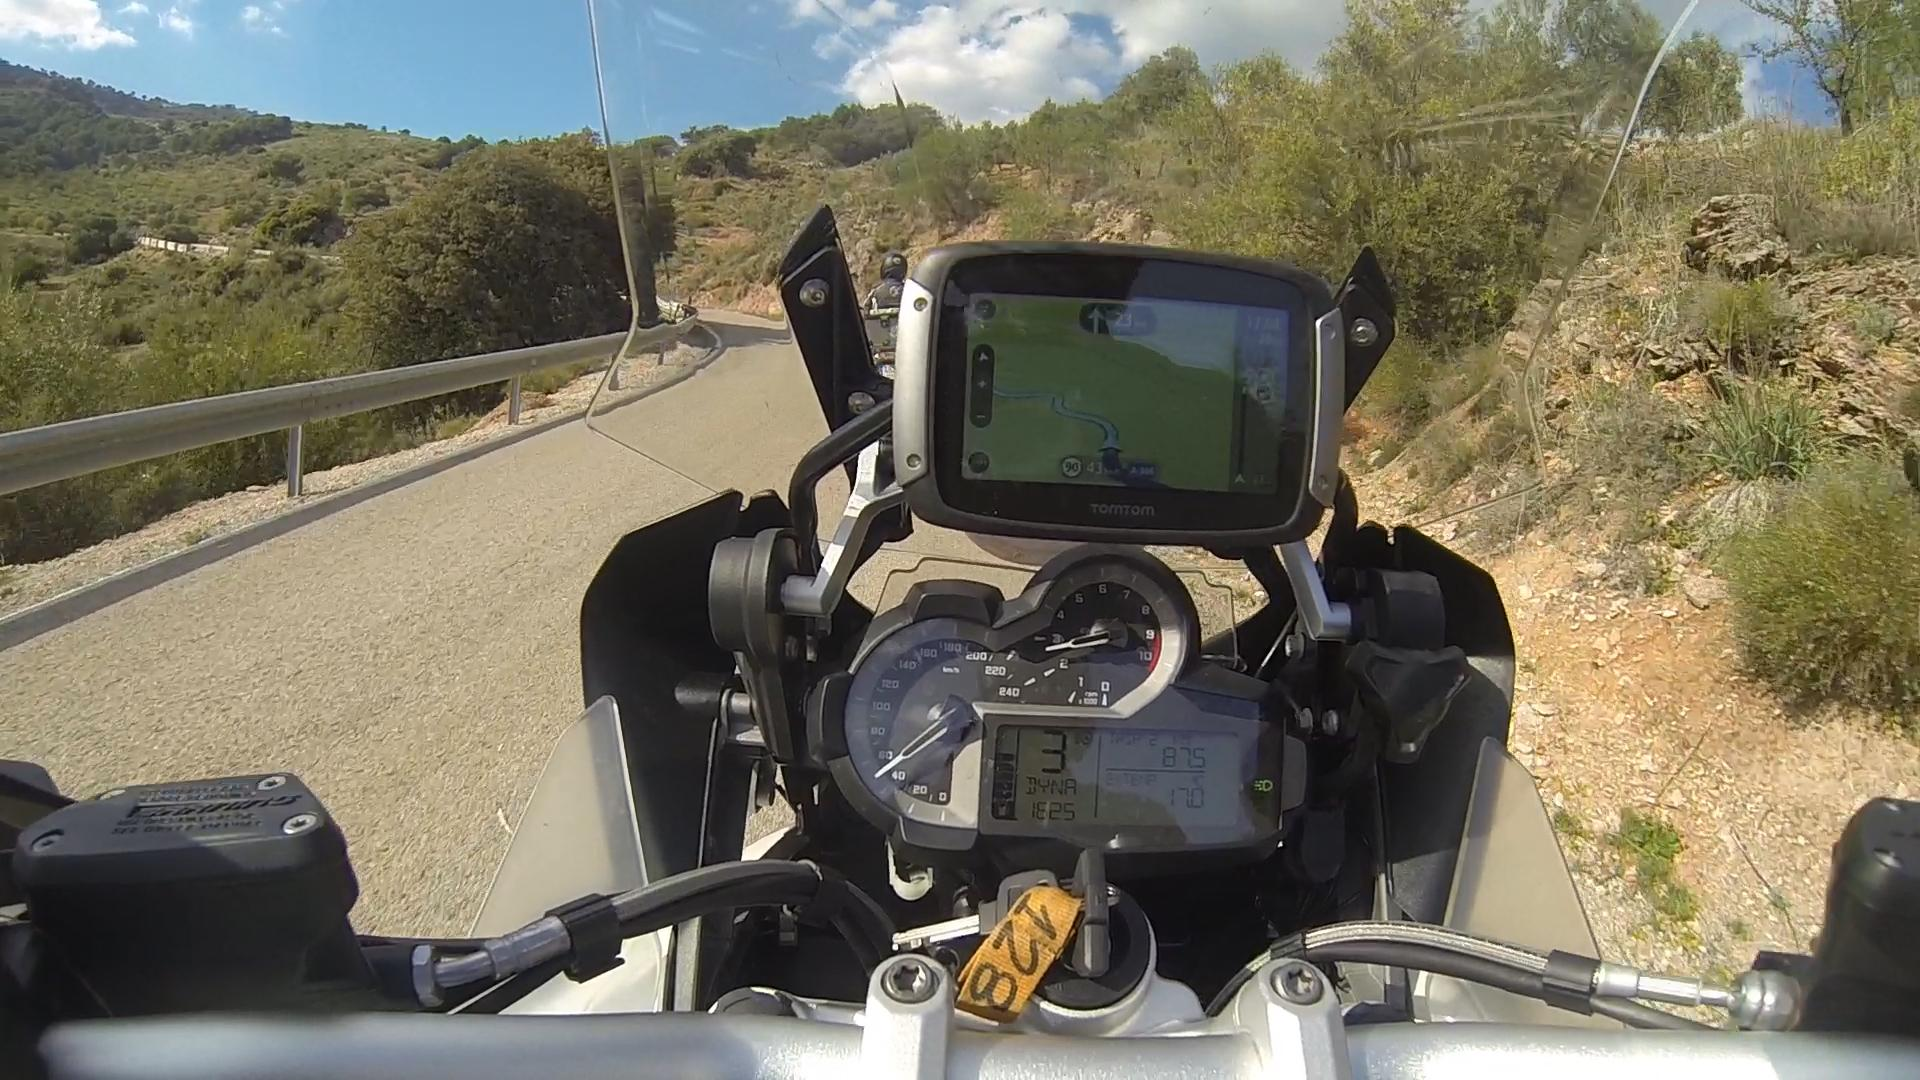 Testmotor Test Tomtom Rijder 400 Navigatiesysteem Kort